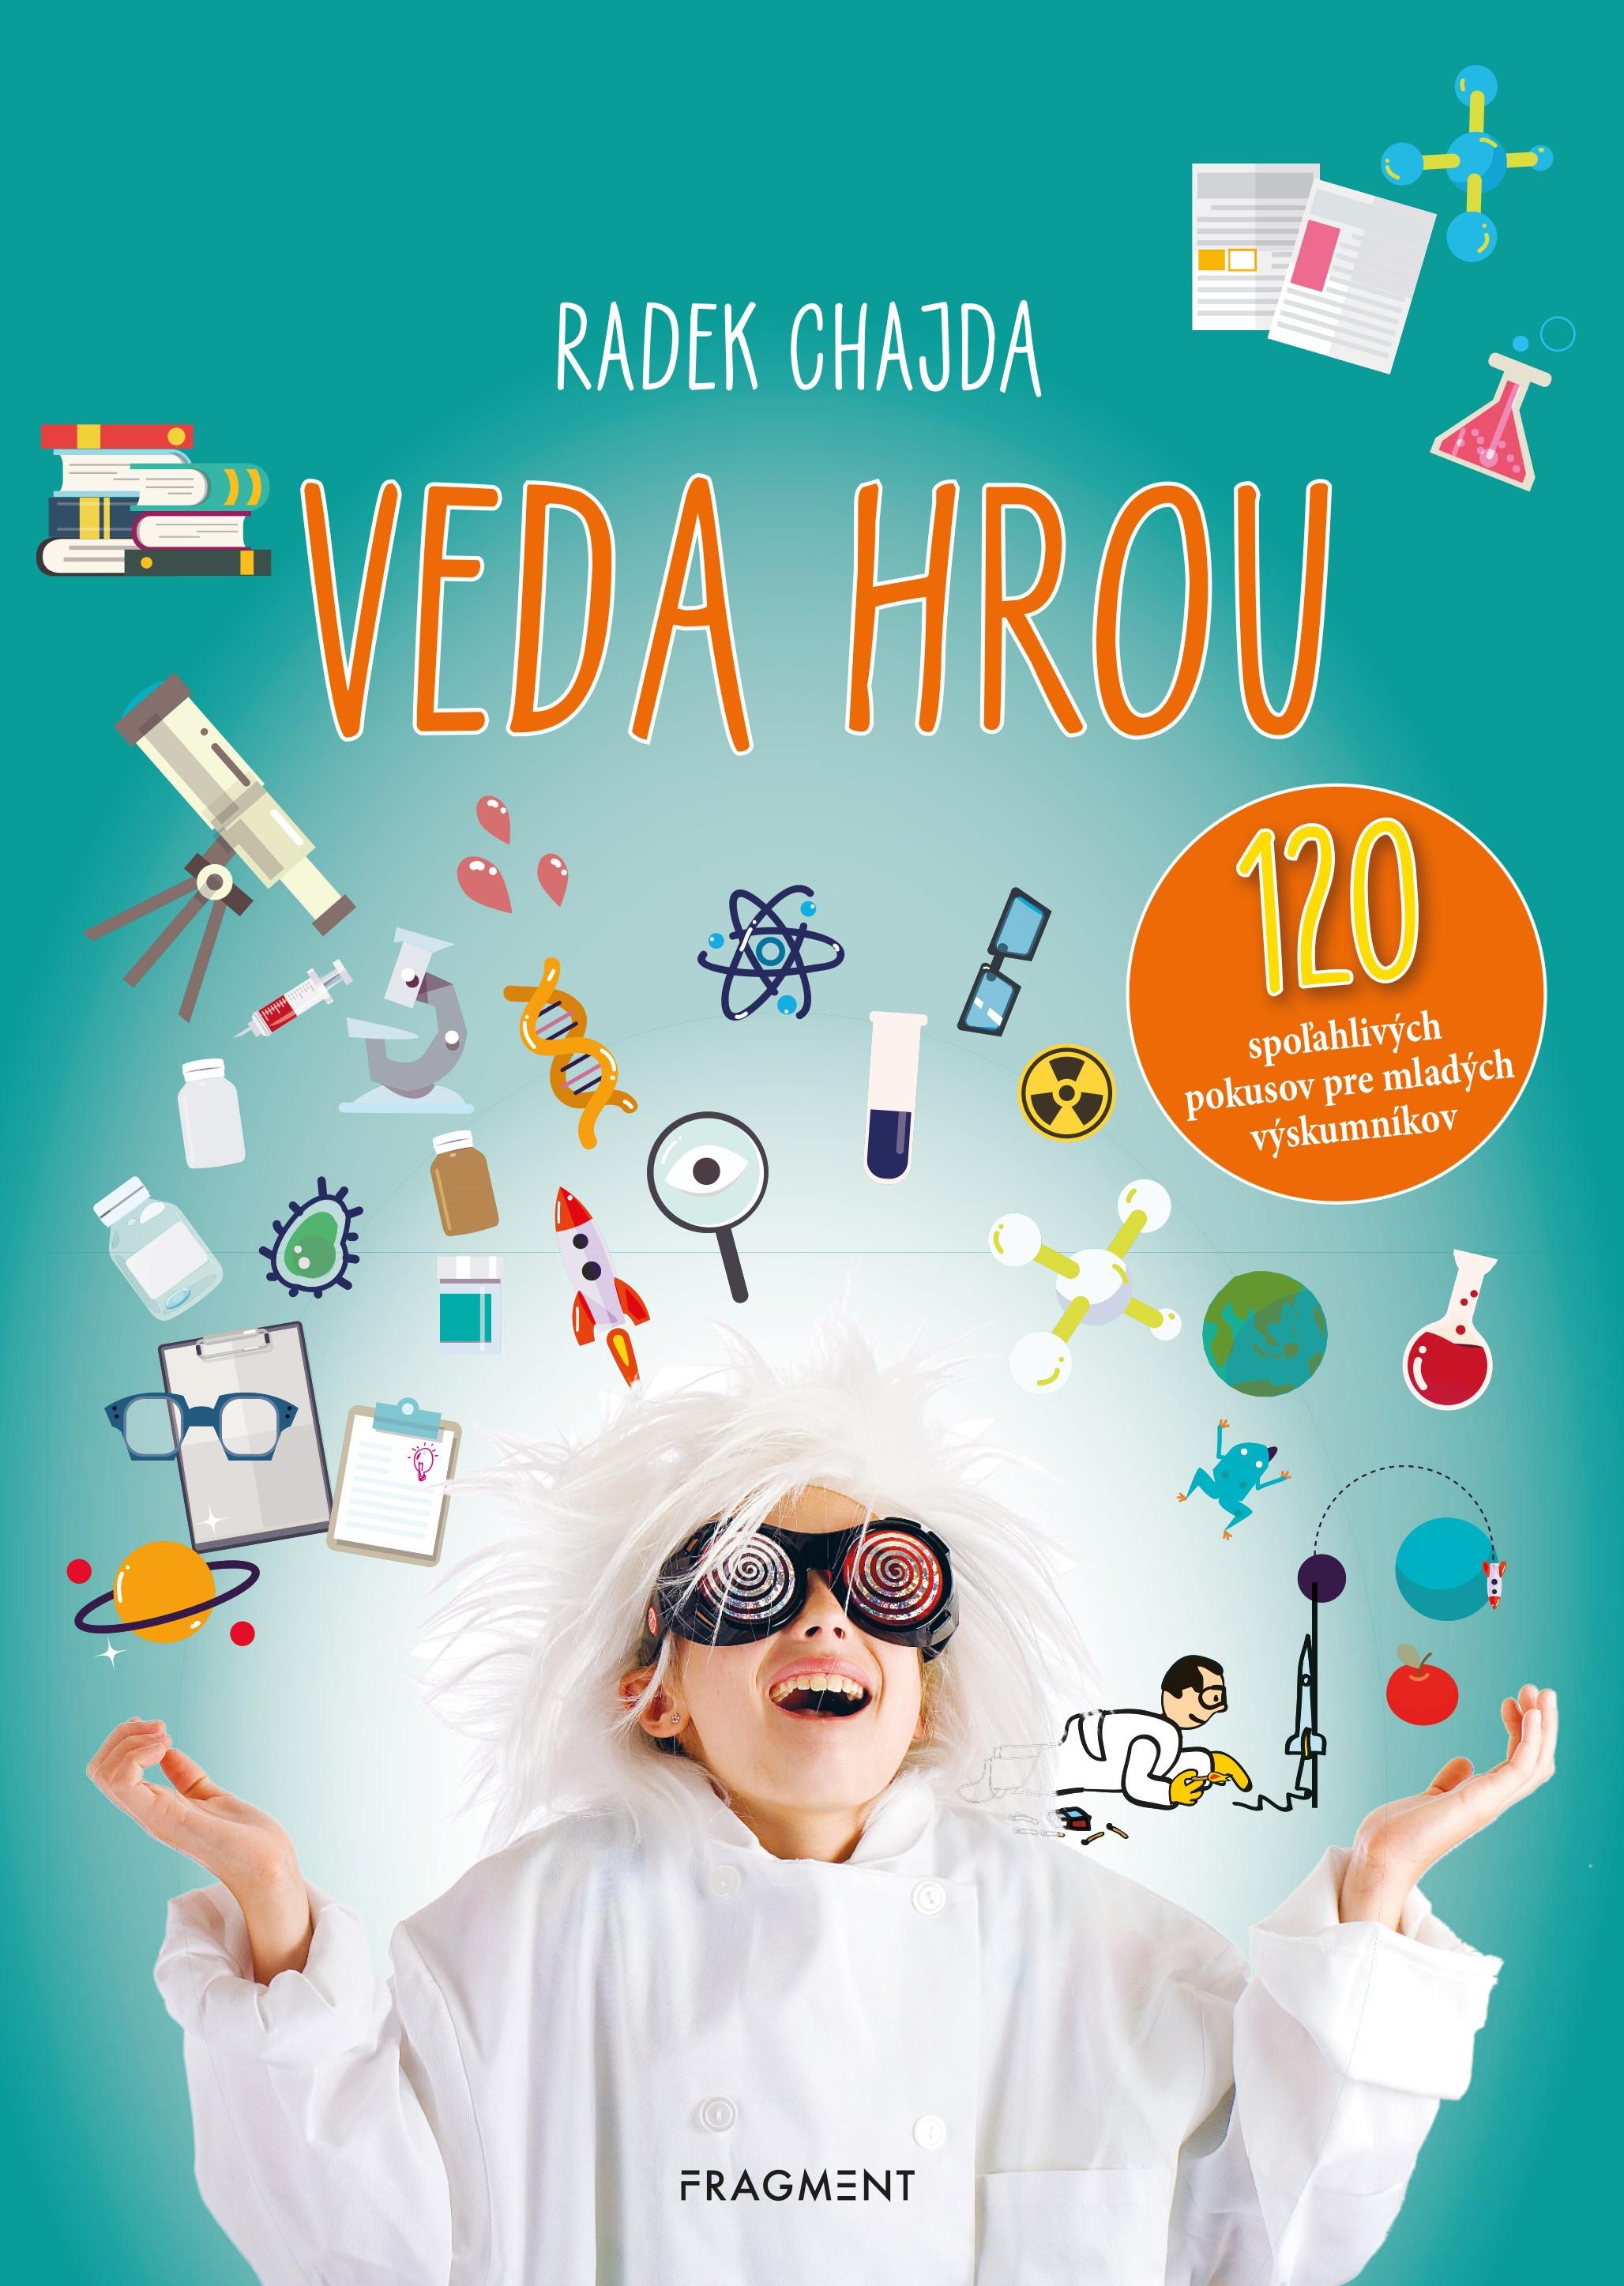 Veda hrou - Radek Chajda